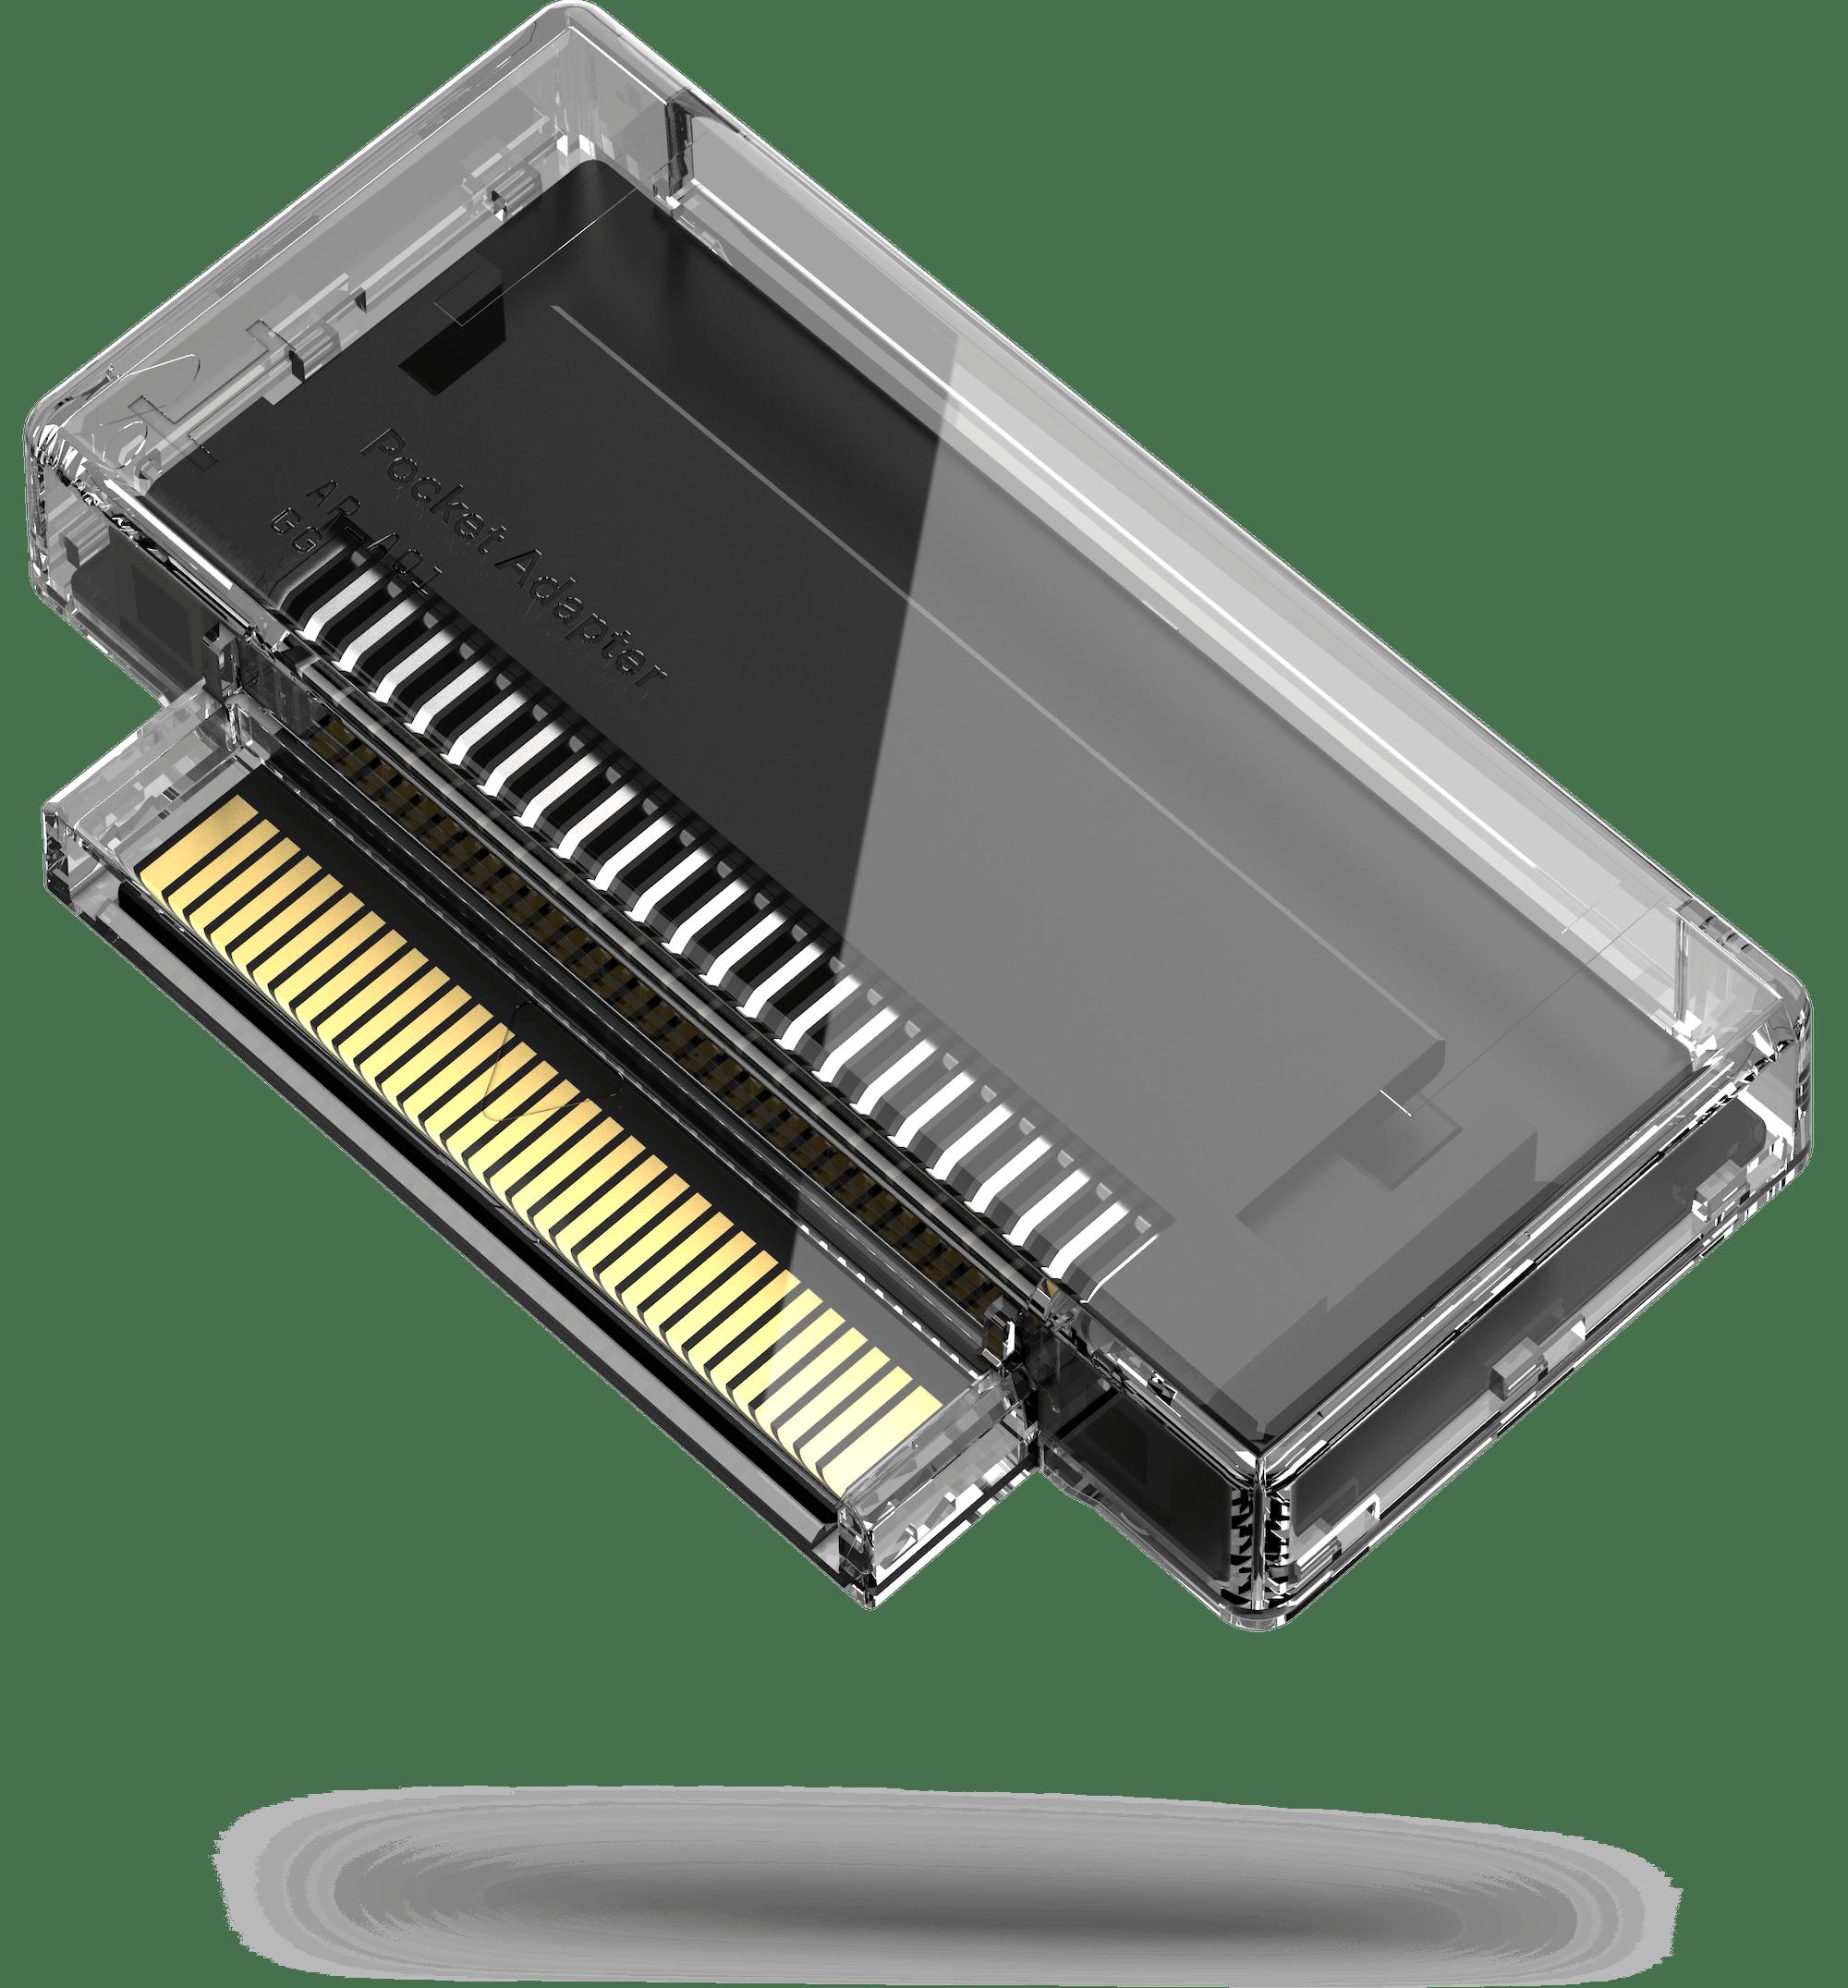 Game Gear Cartridge Adapter